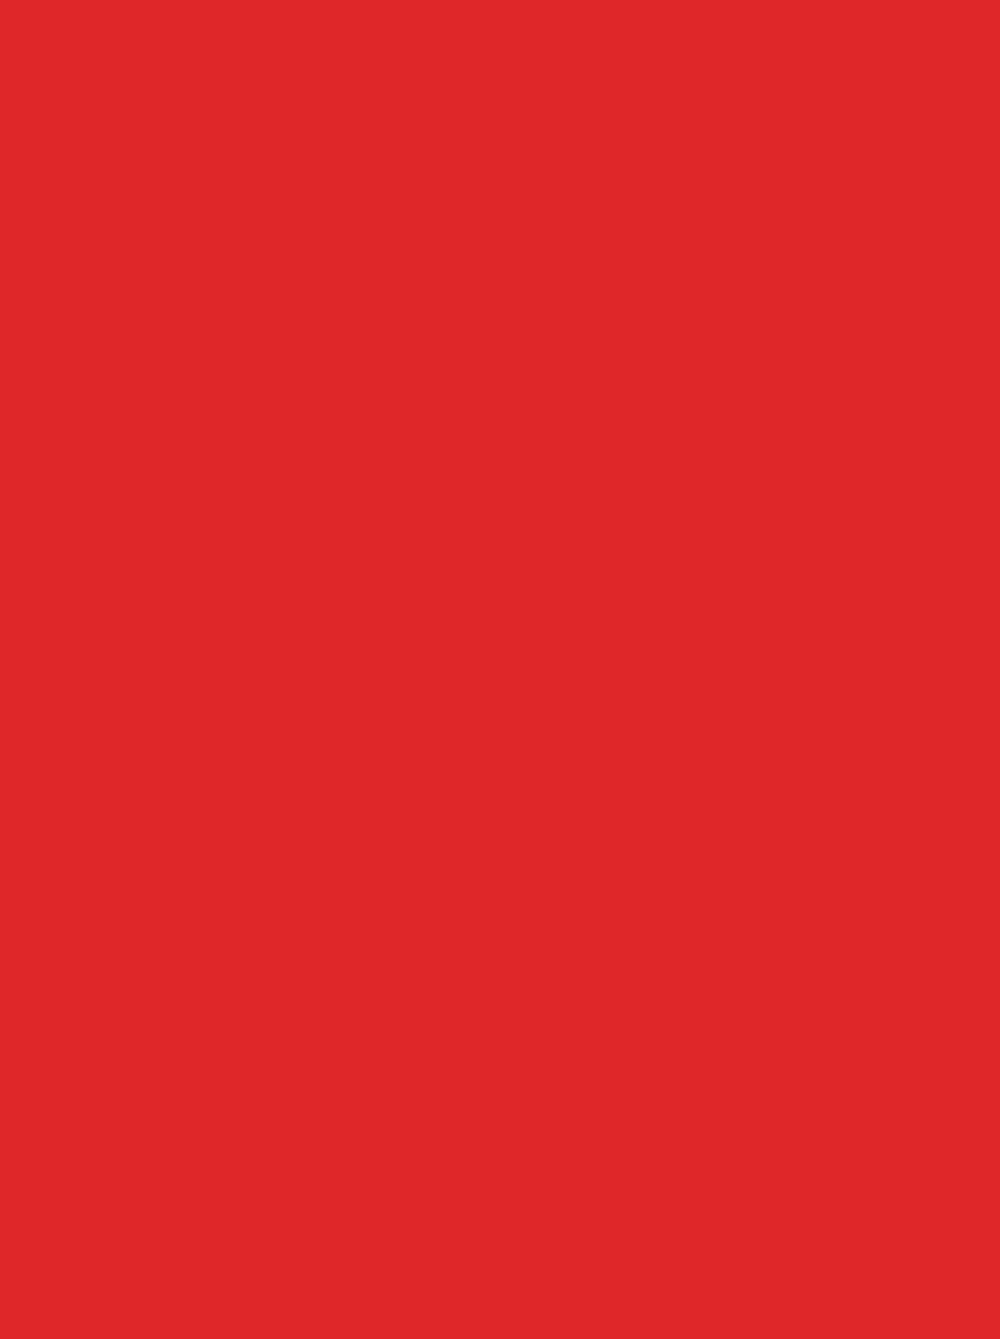 red+spacer.jpg